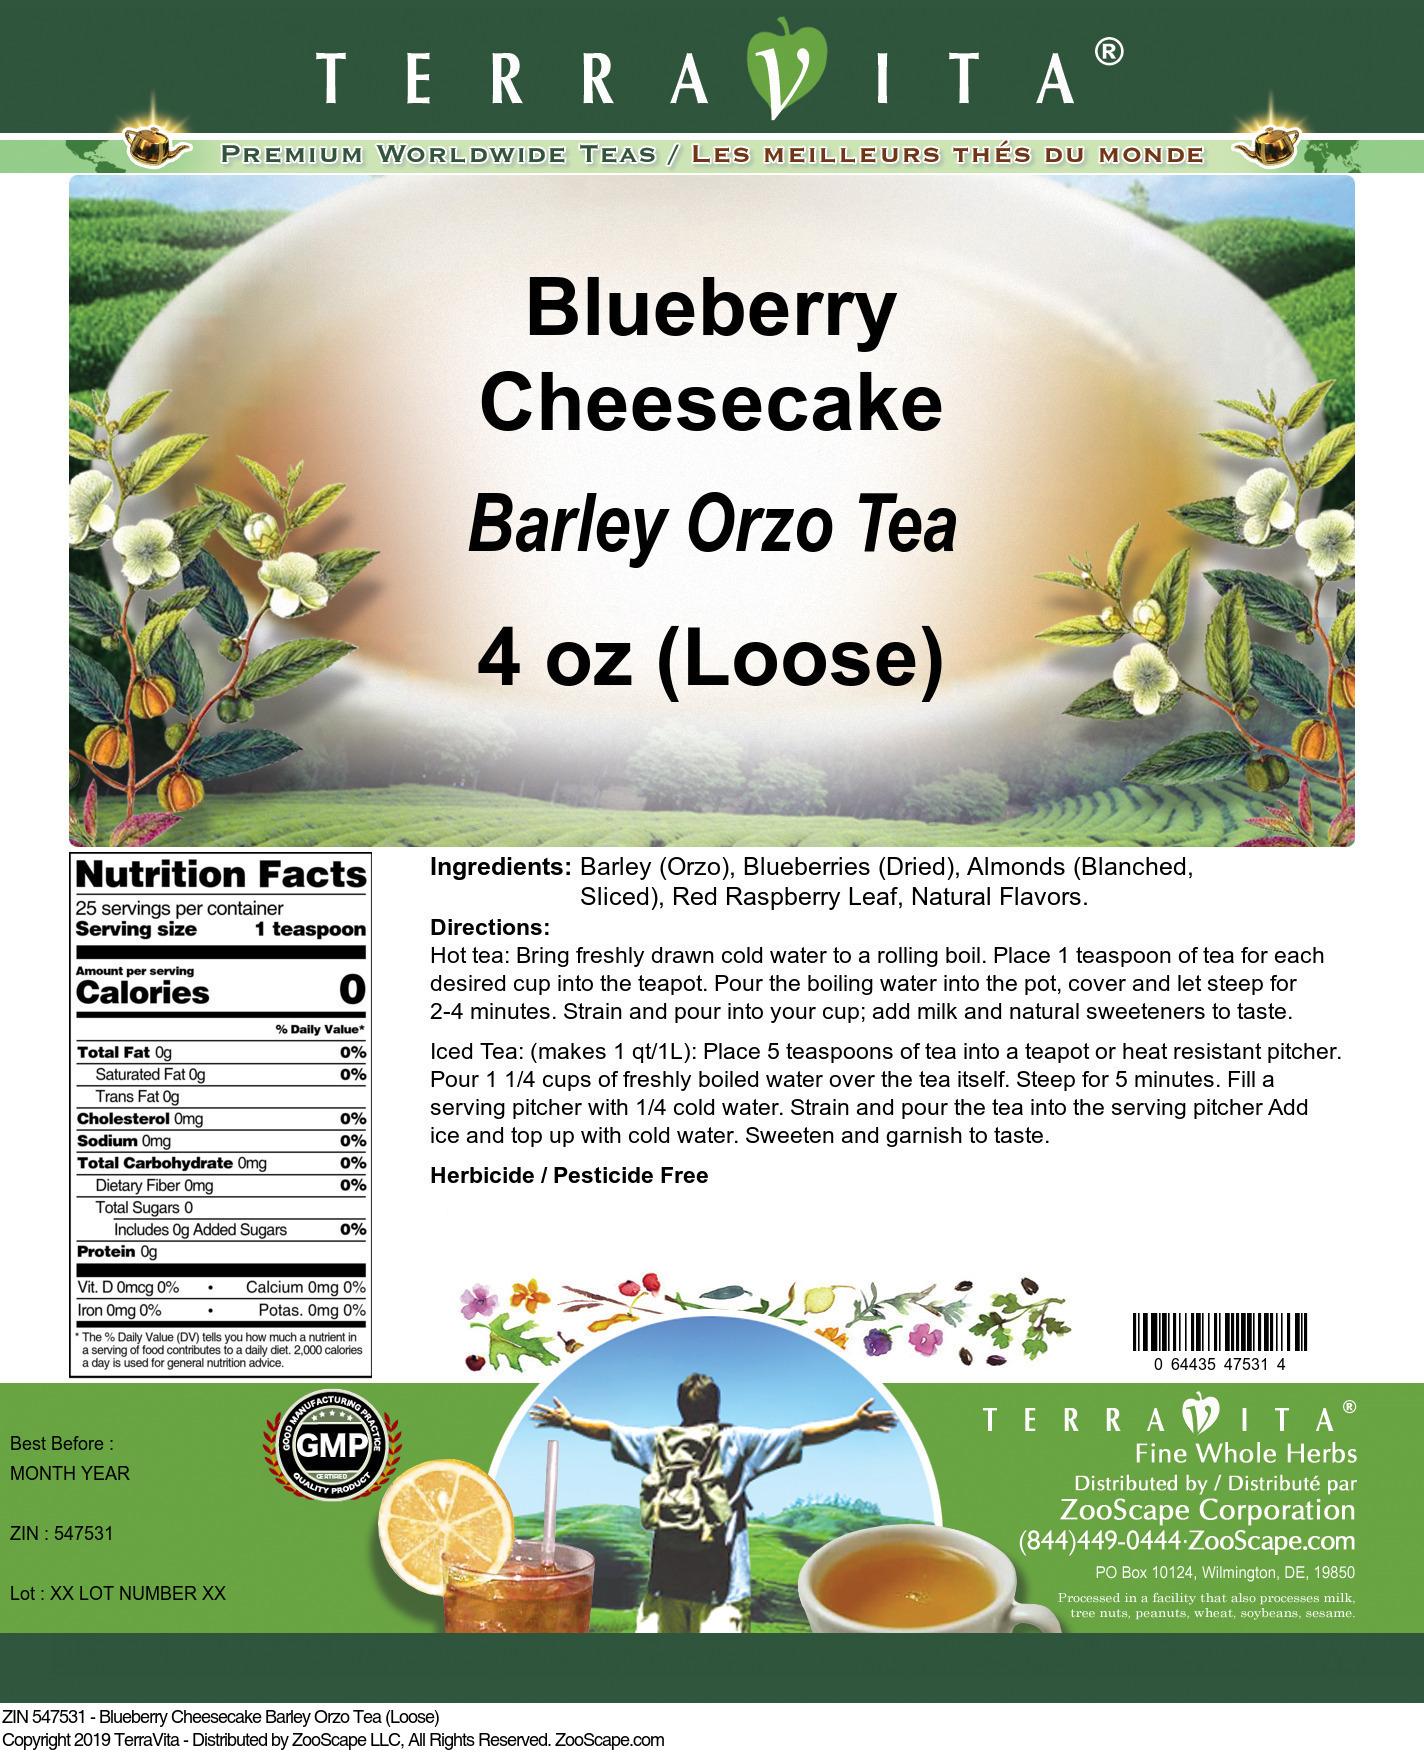 Blueberry Cheesecake Barley Orzo